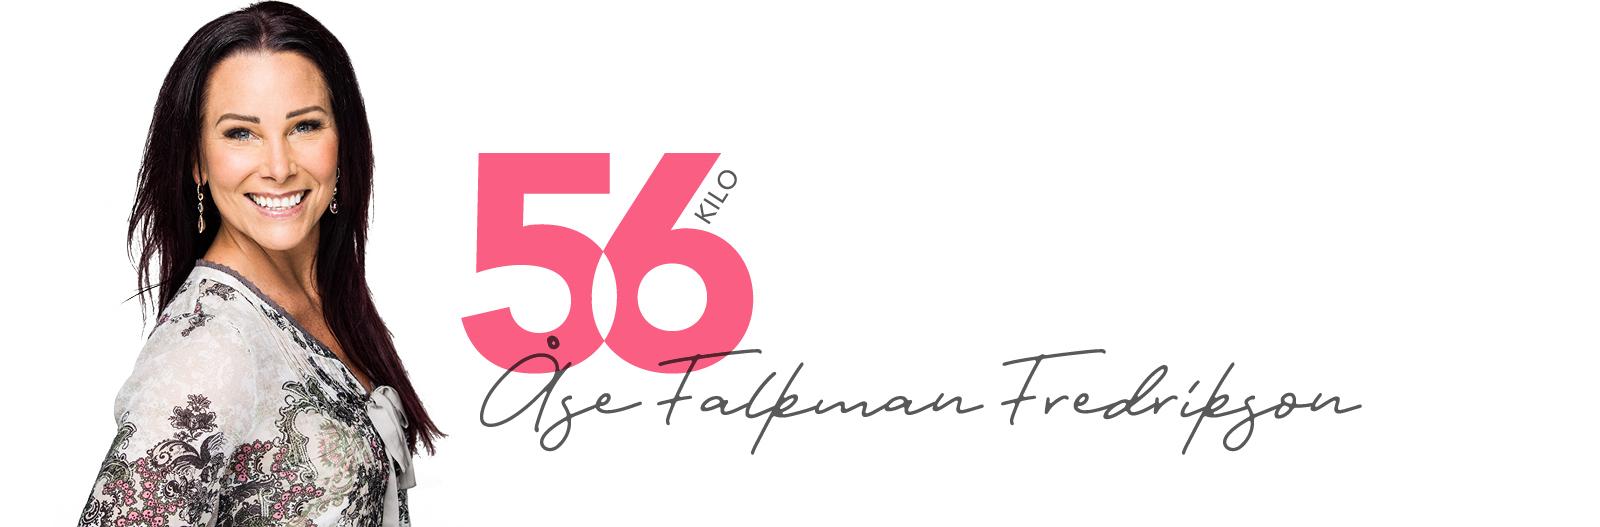 56kilo.se | LCHF Recept & Livets goda